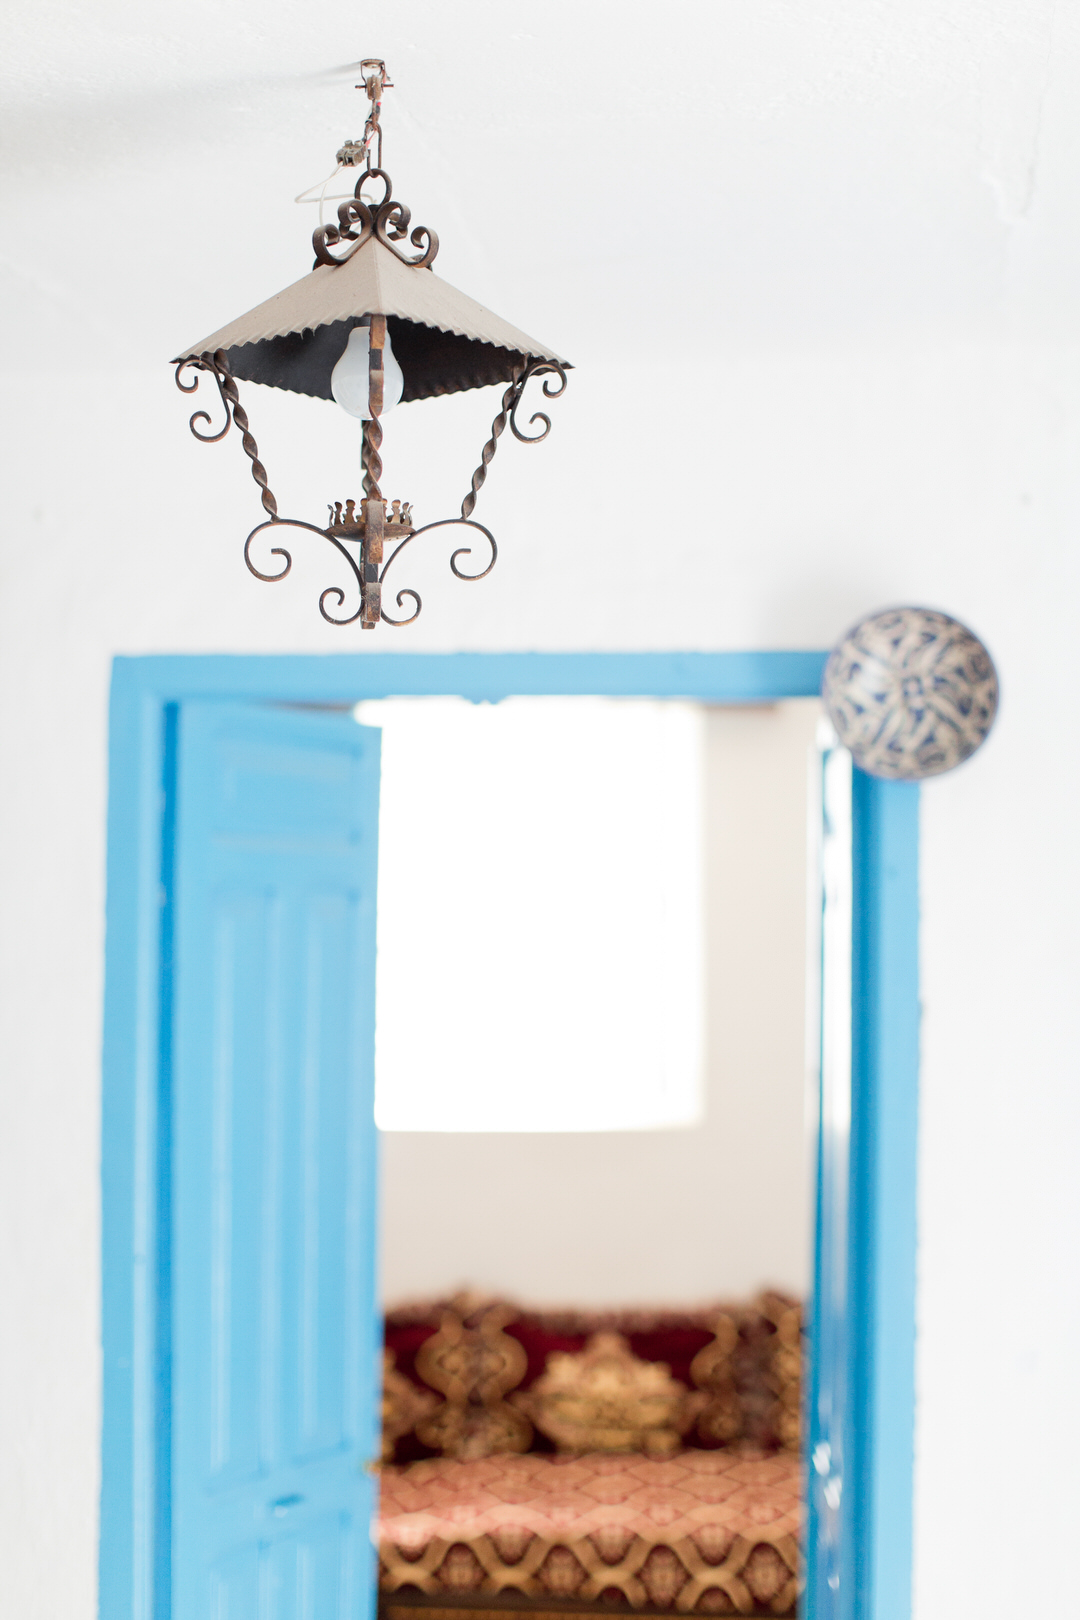 Melissa Kruse Photography - Chefchaouen Morocco (web)-11.jpg